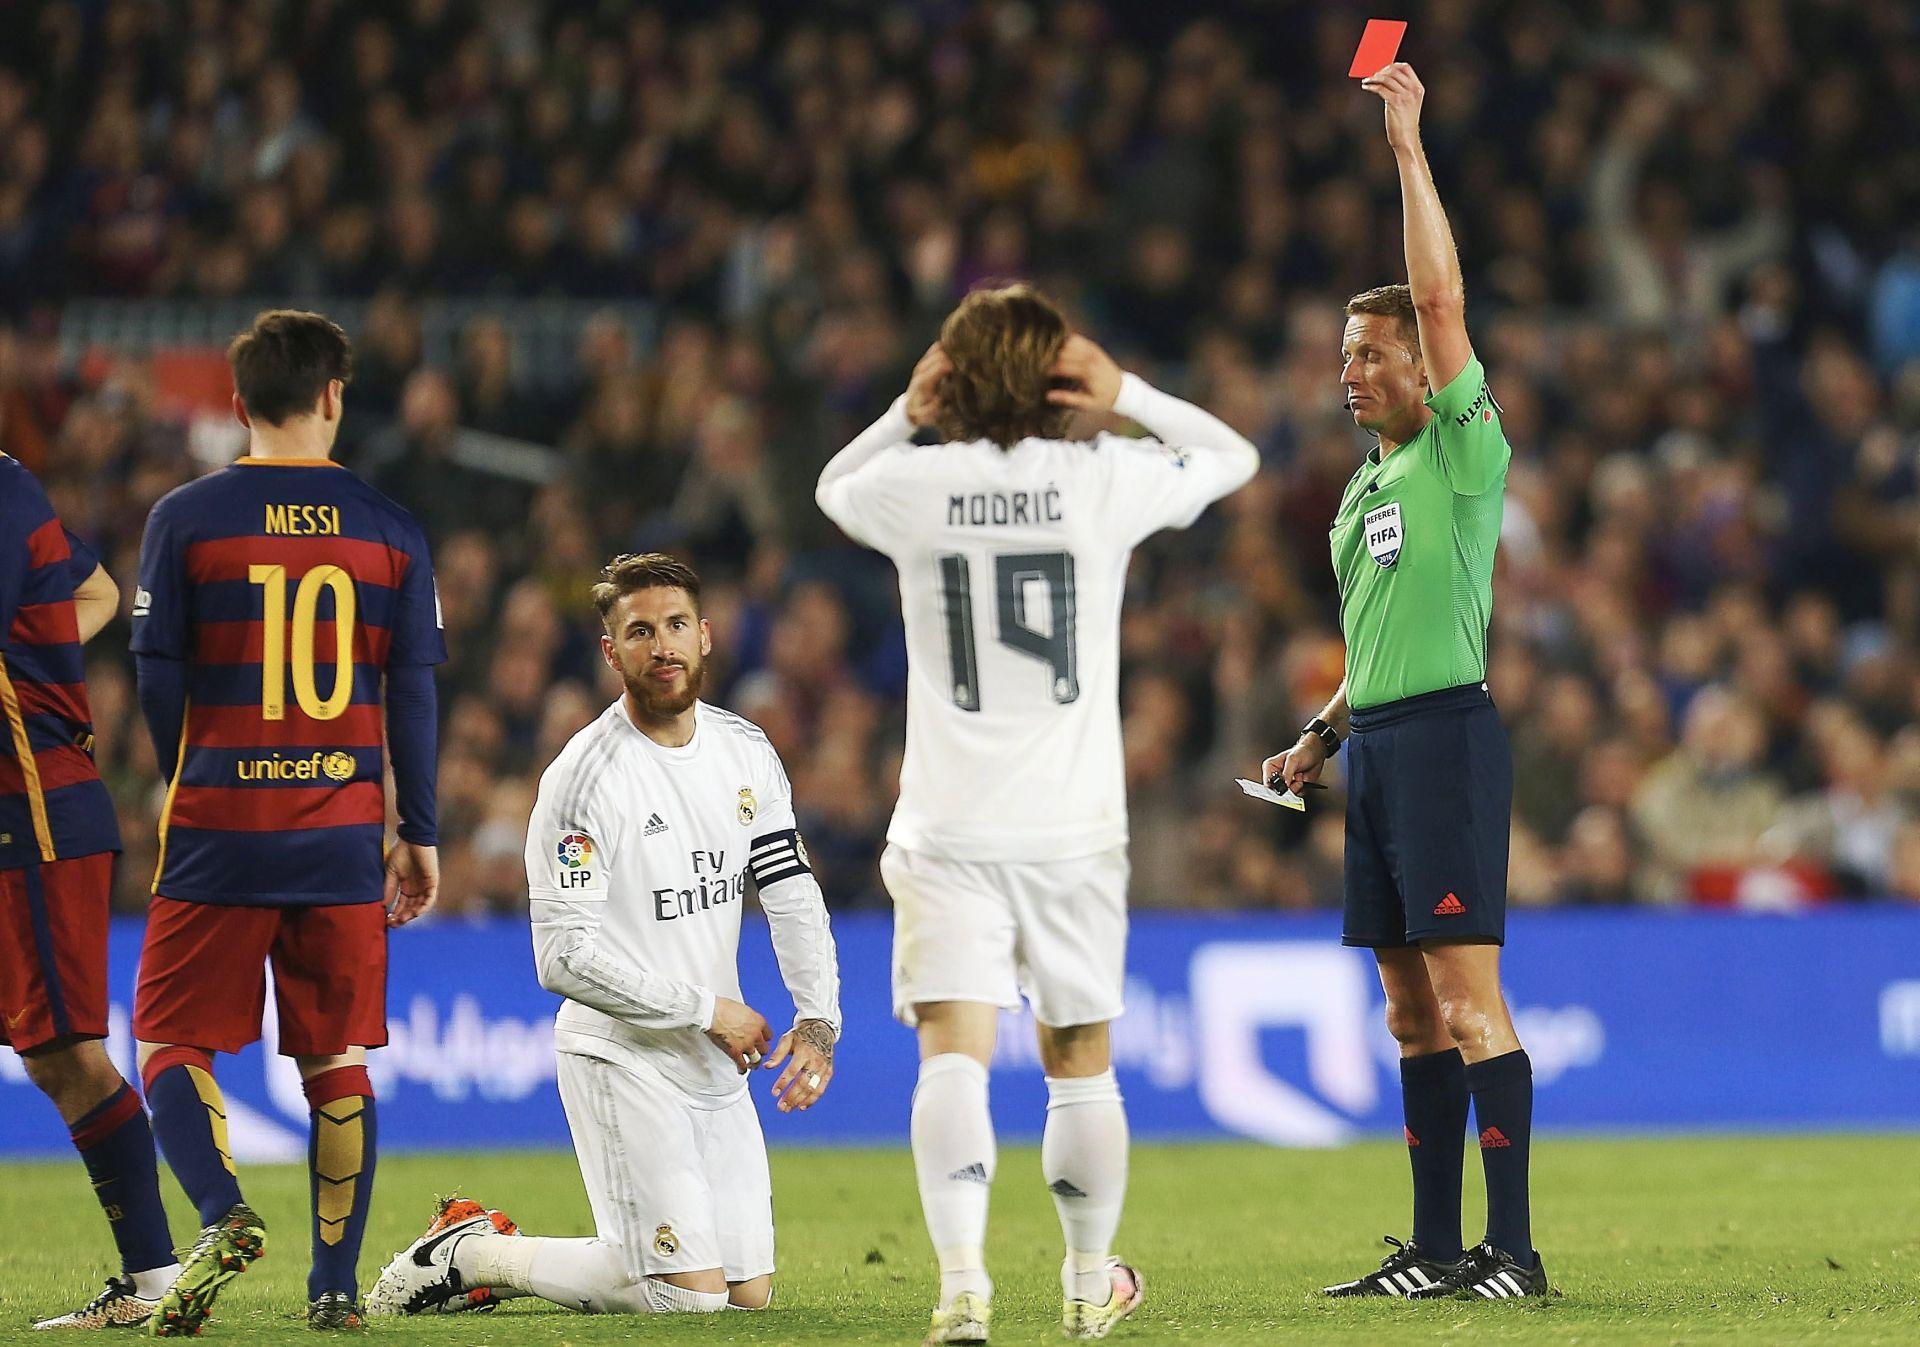 NESLAVNI REKORD Sergio Ramos u El Clasicu zaradio 21. crveni karton